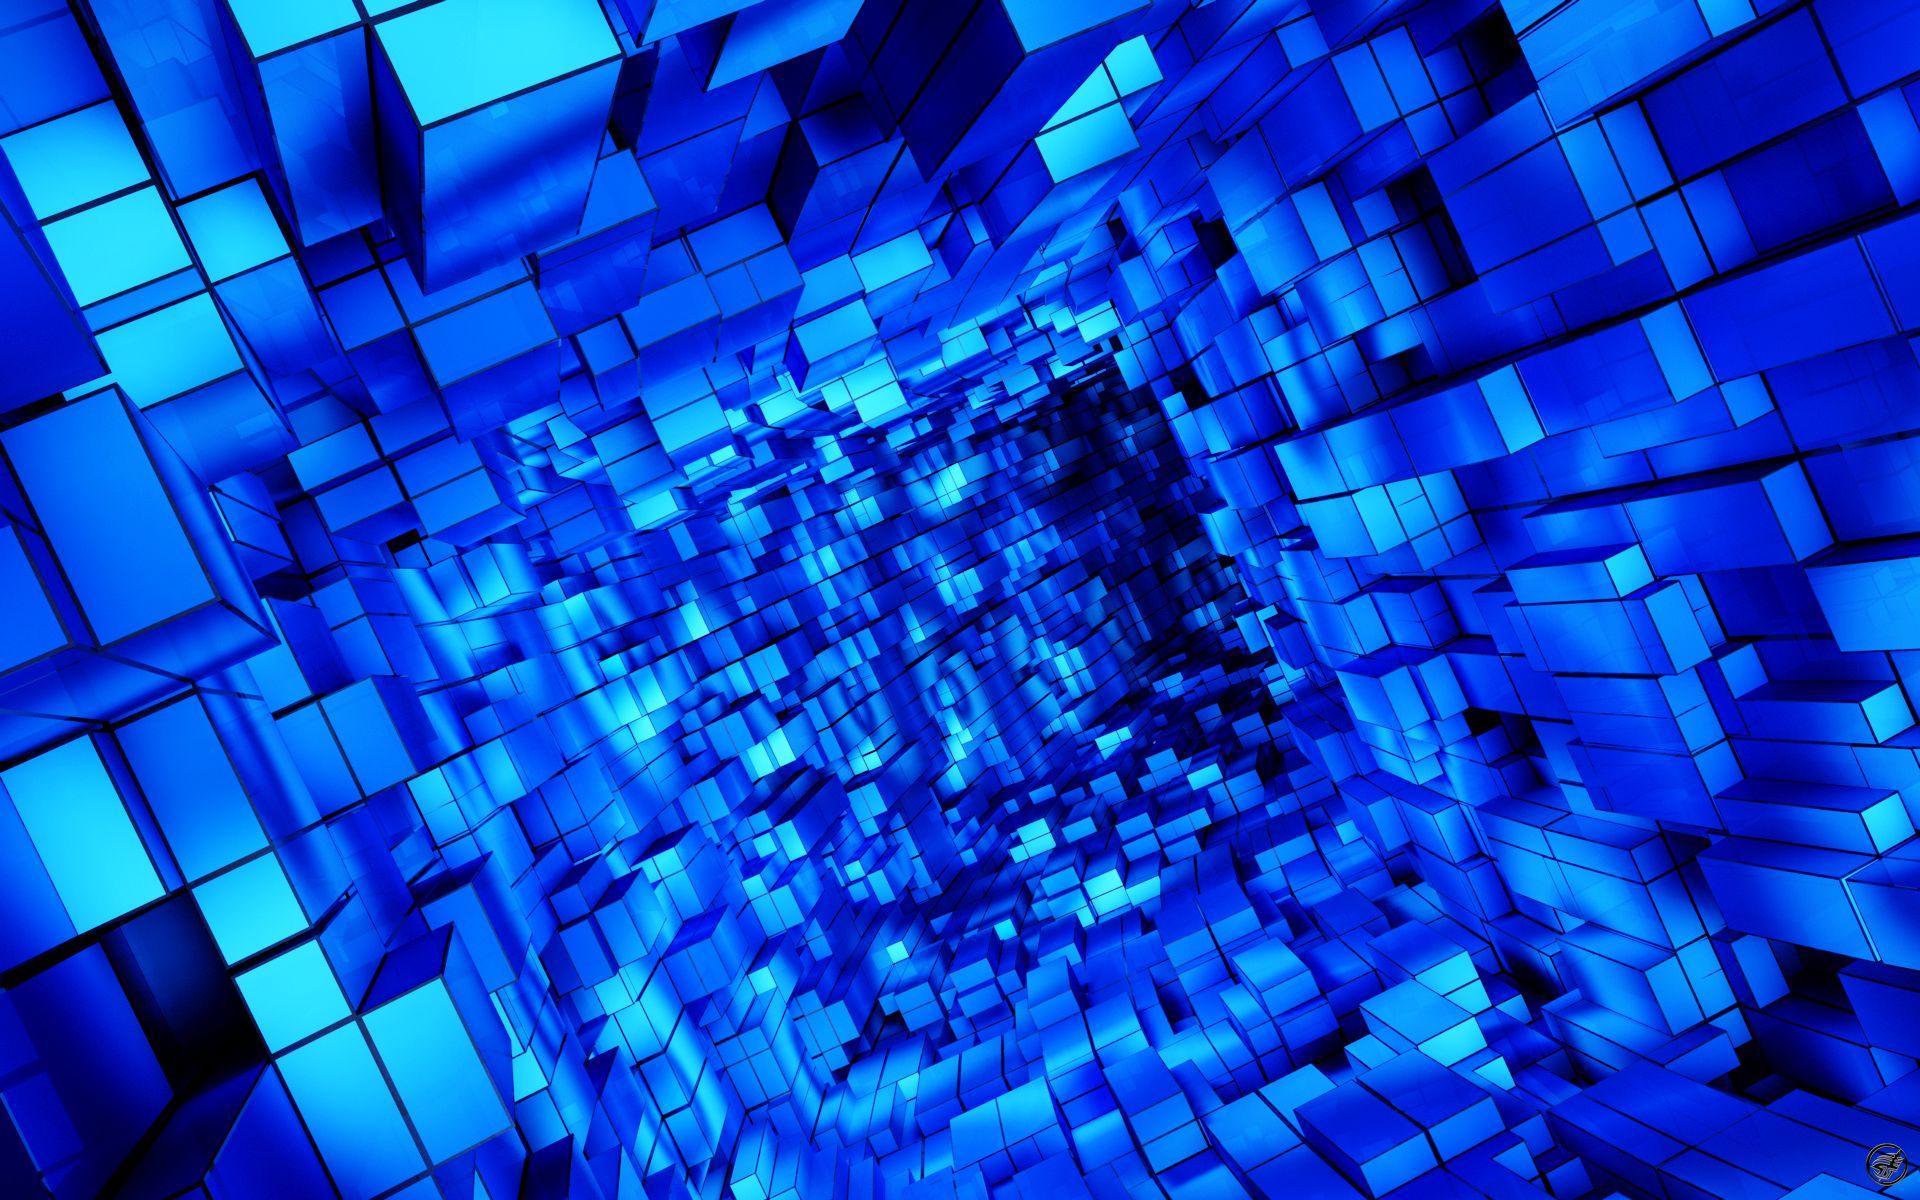 The Blue Cubes Way Wallpaper Hd Http Imashon Com W Blue Cubes Way Wallpaper Hd Html Blue Background Wallpapers Cool Blue Wallpaper Blue Abstract